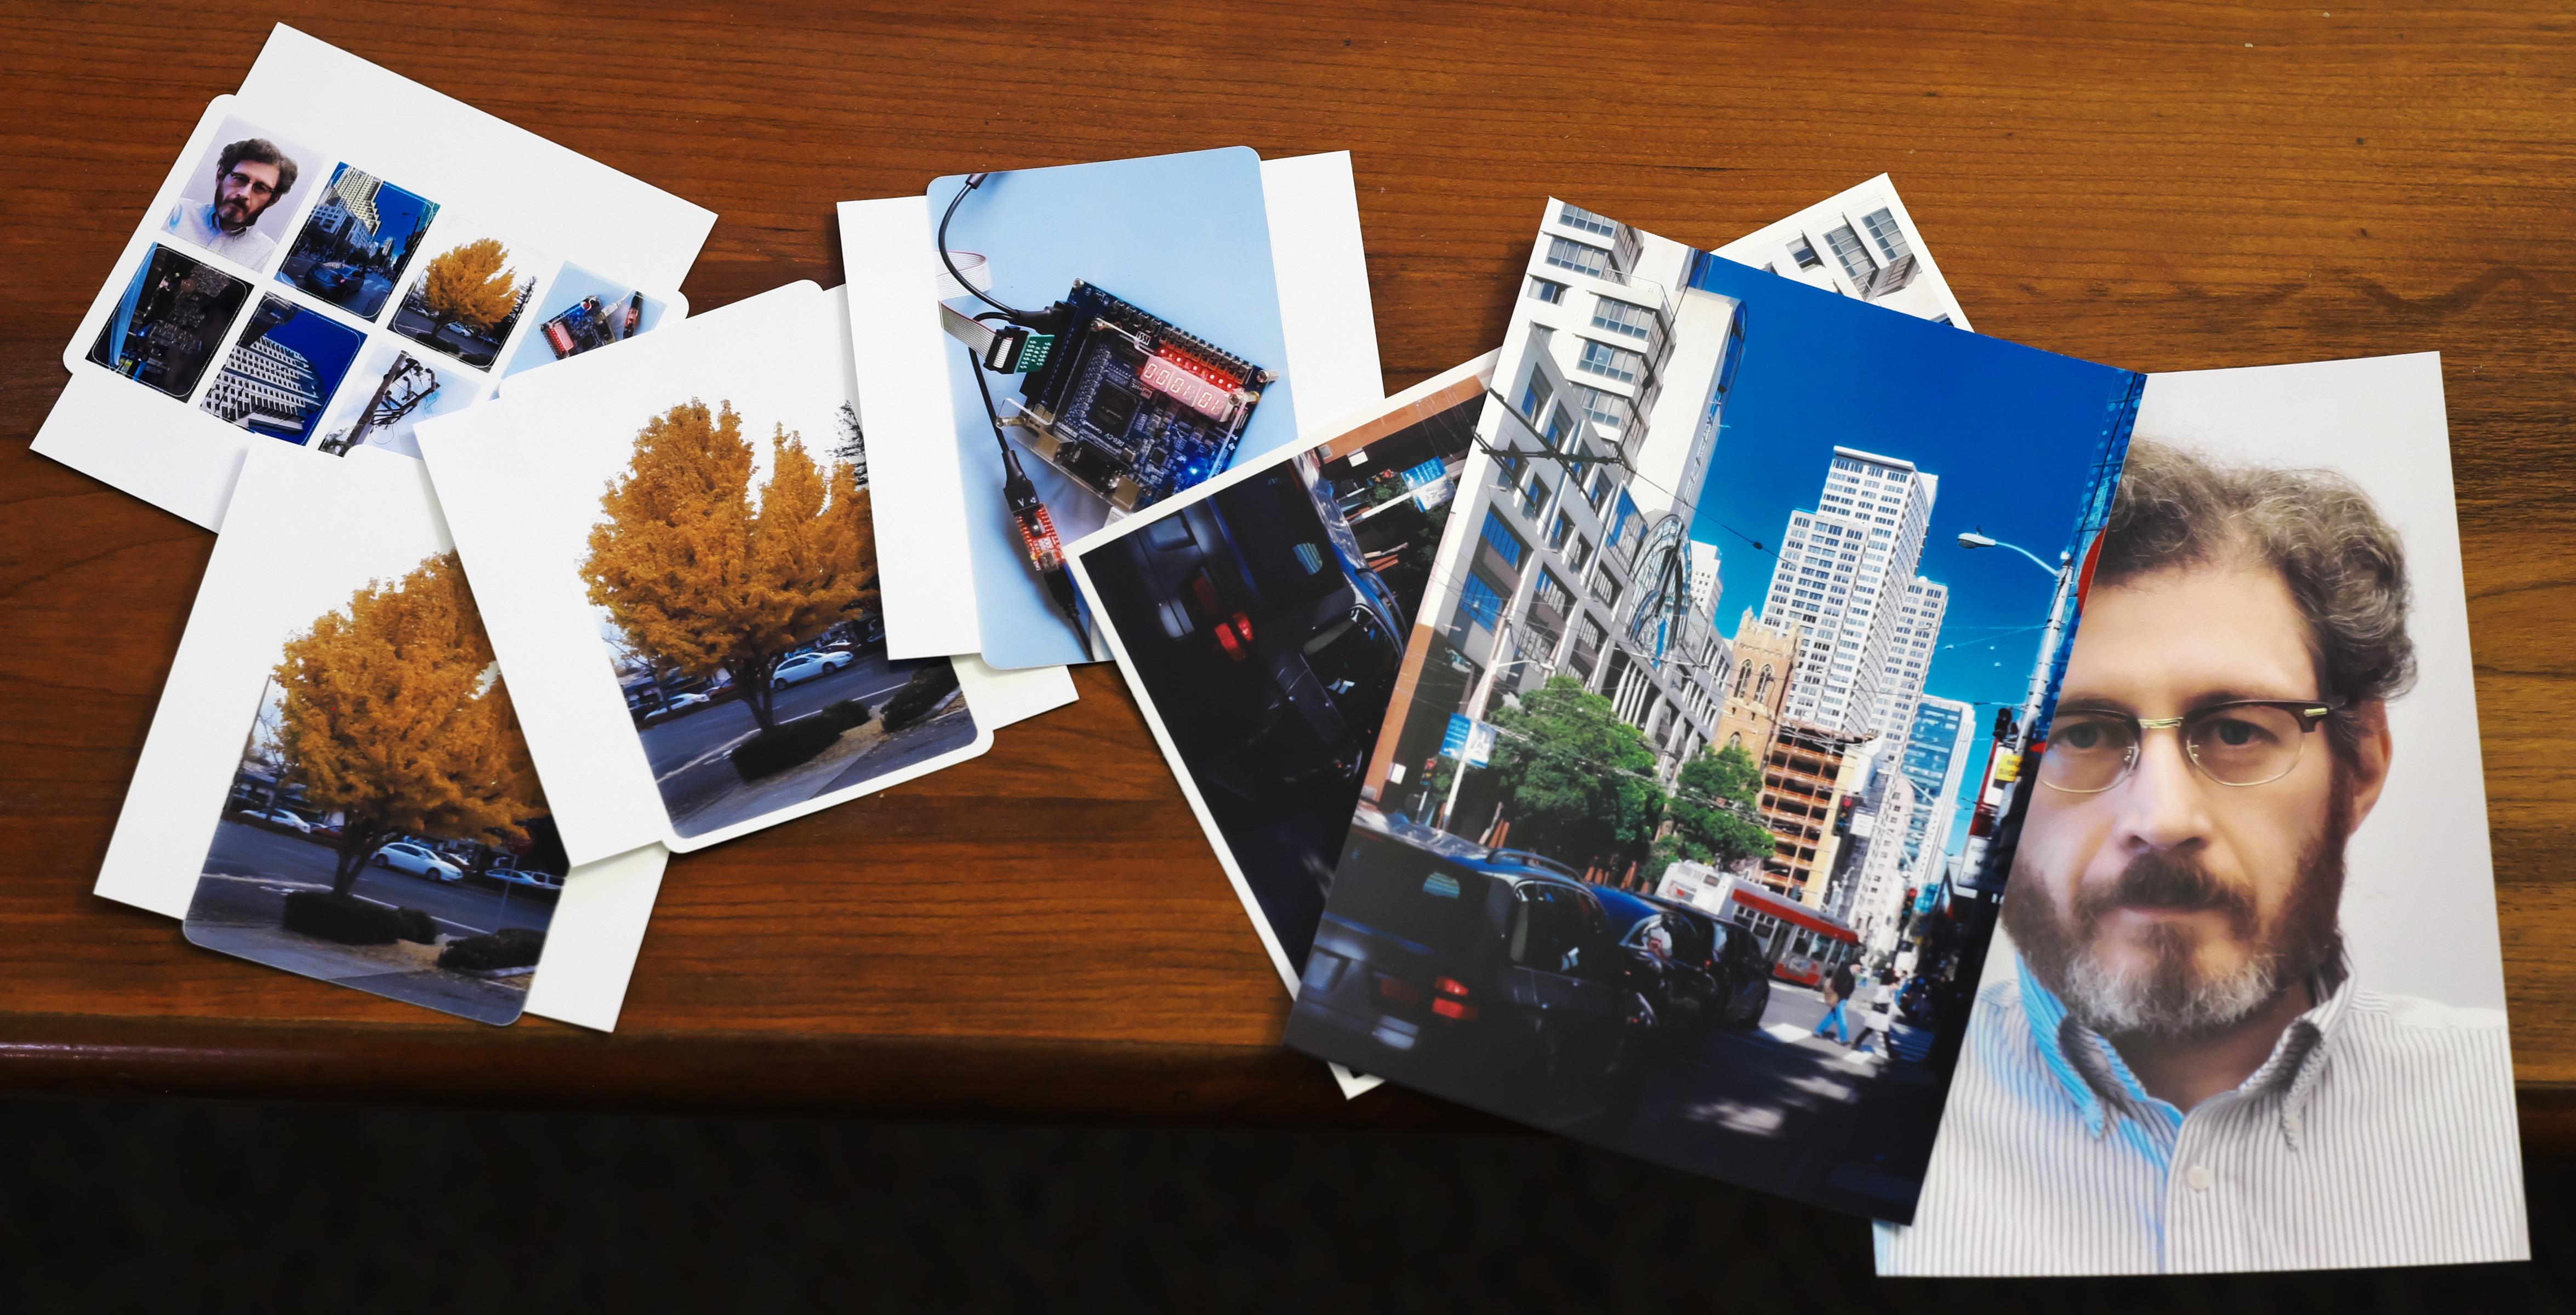 Best instant printer?: Printers and Printing Forum: Digital